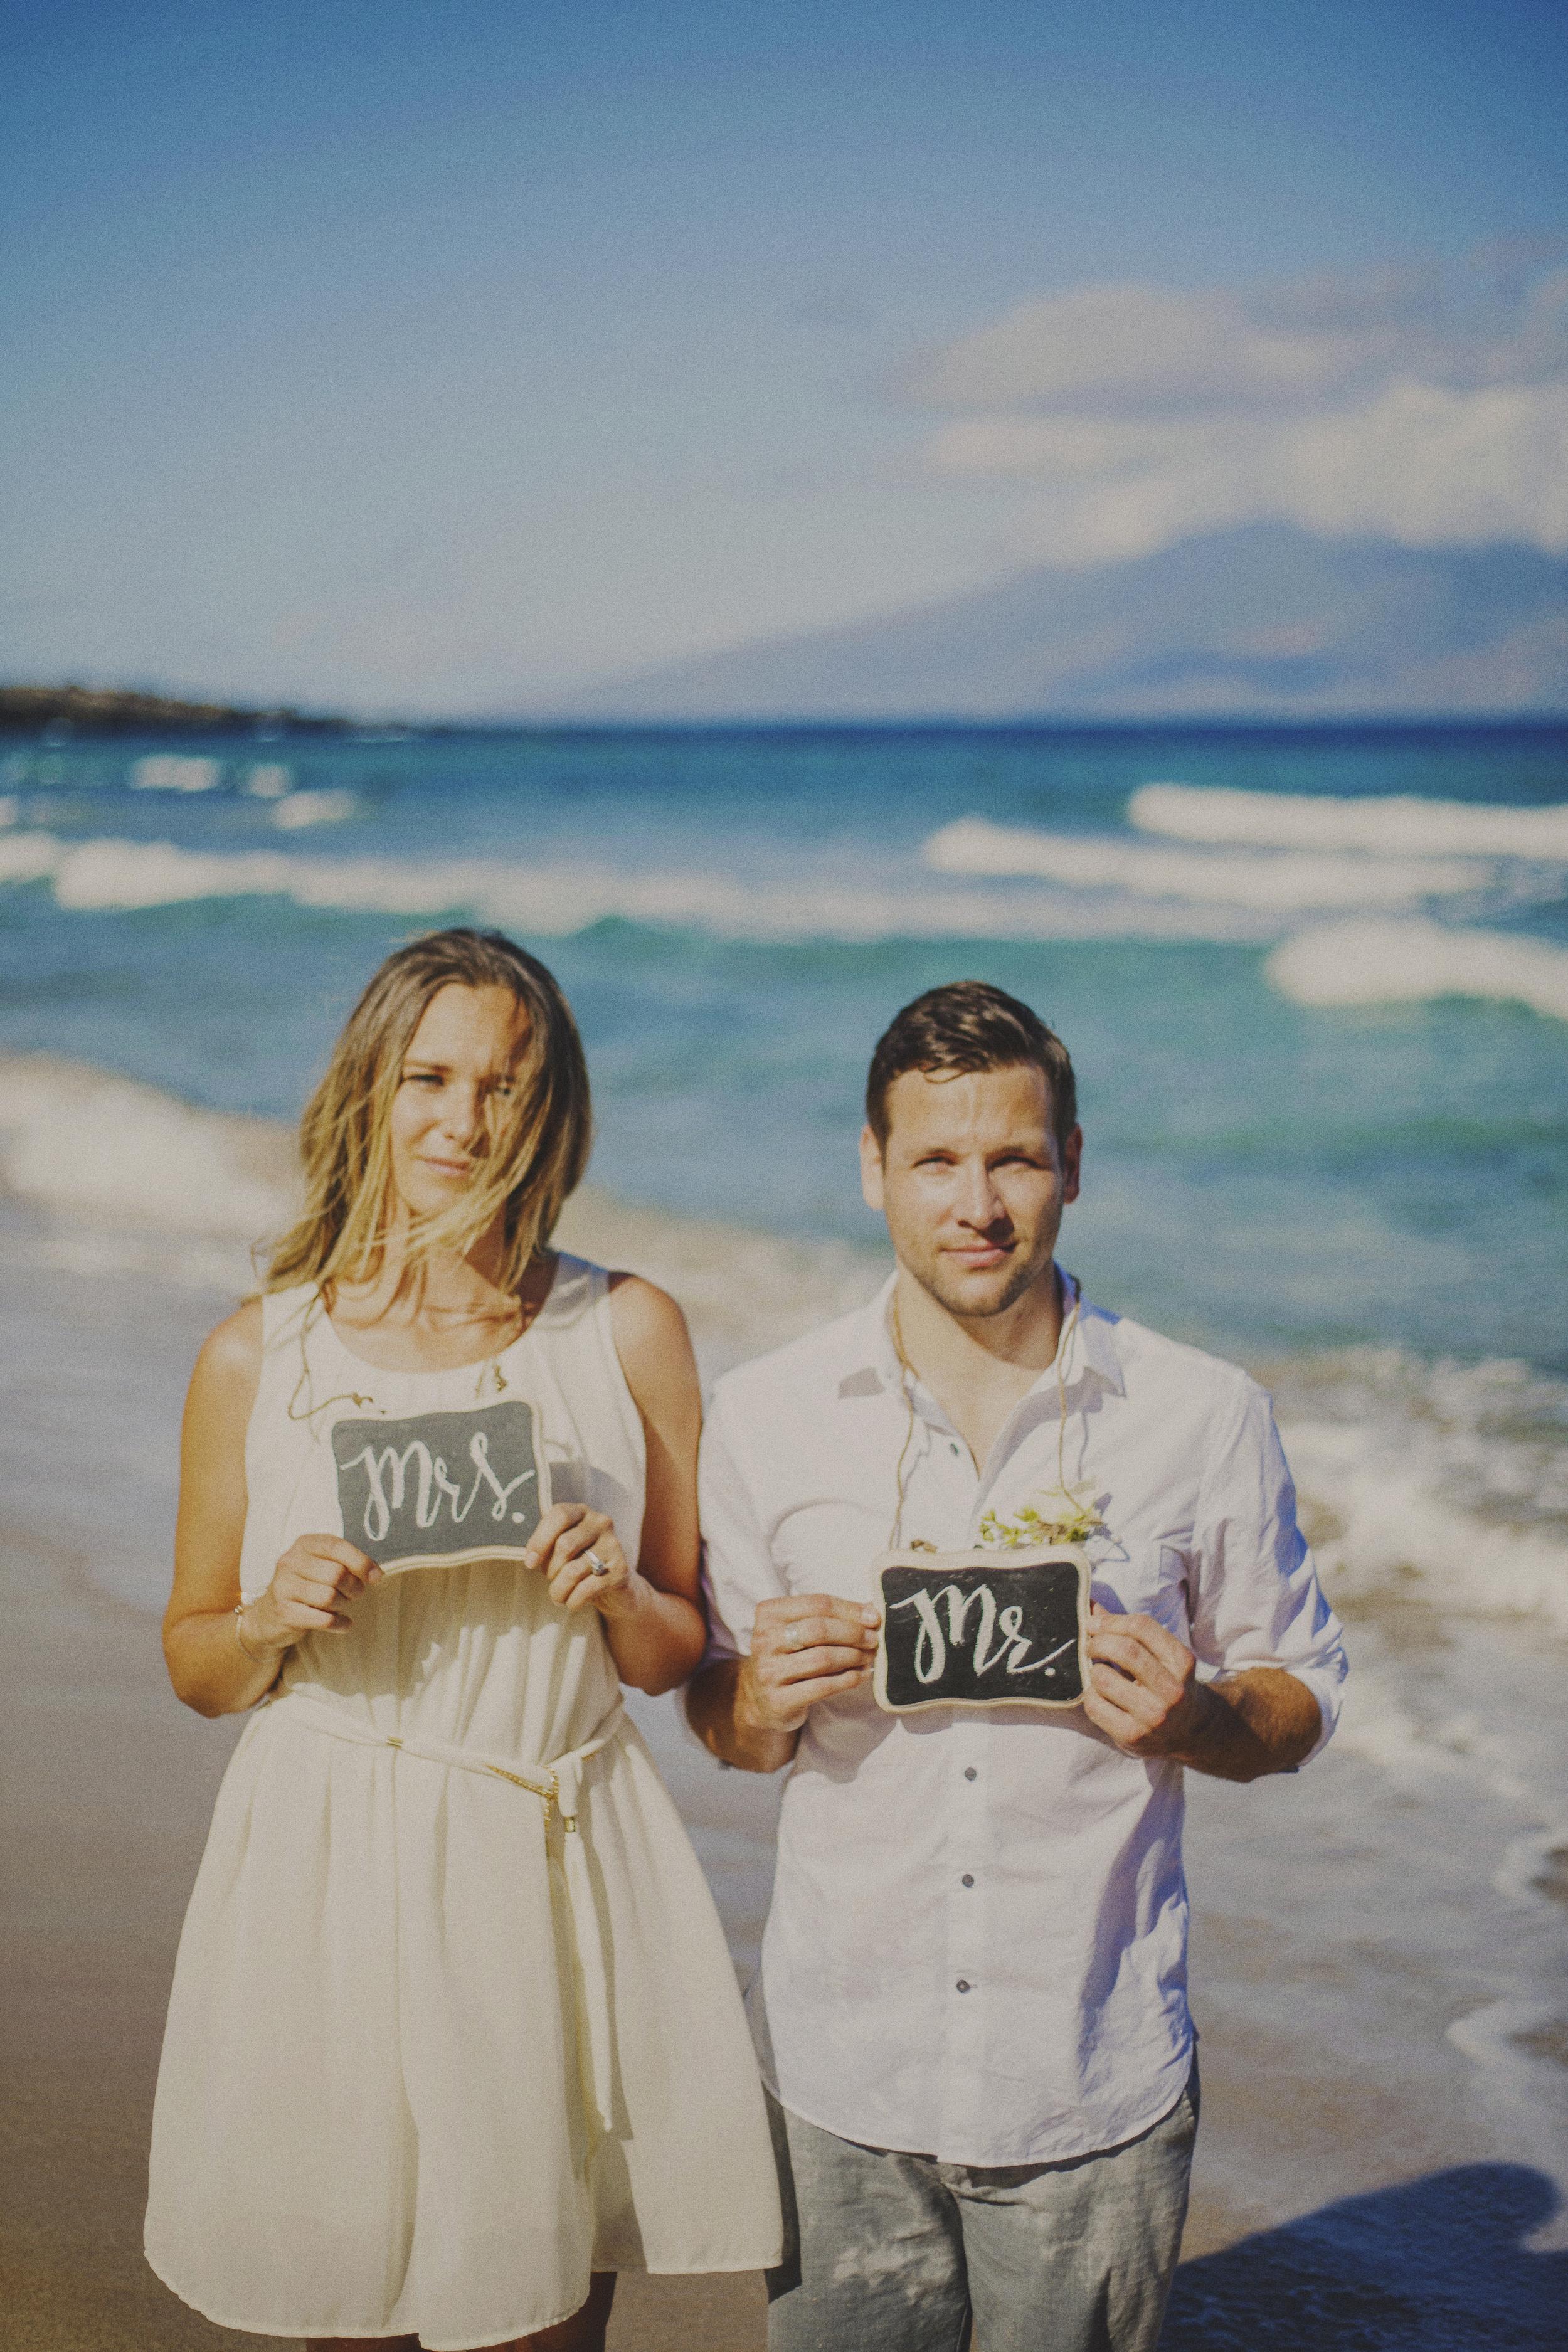 angie-diaz-photography-maui-elopement-oneloa-ironwoods-beach-28.jpg